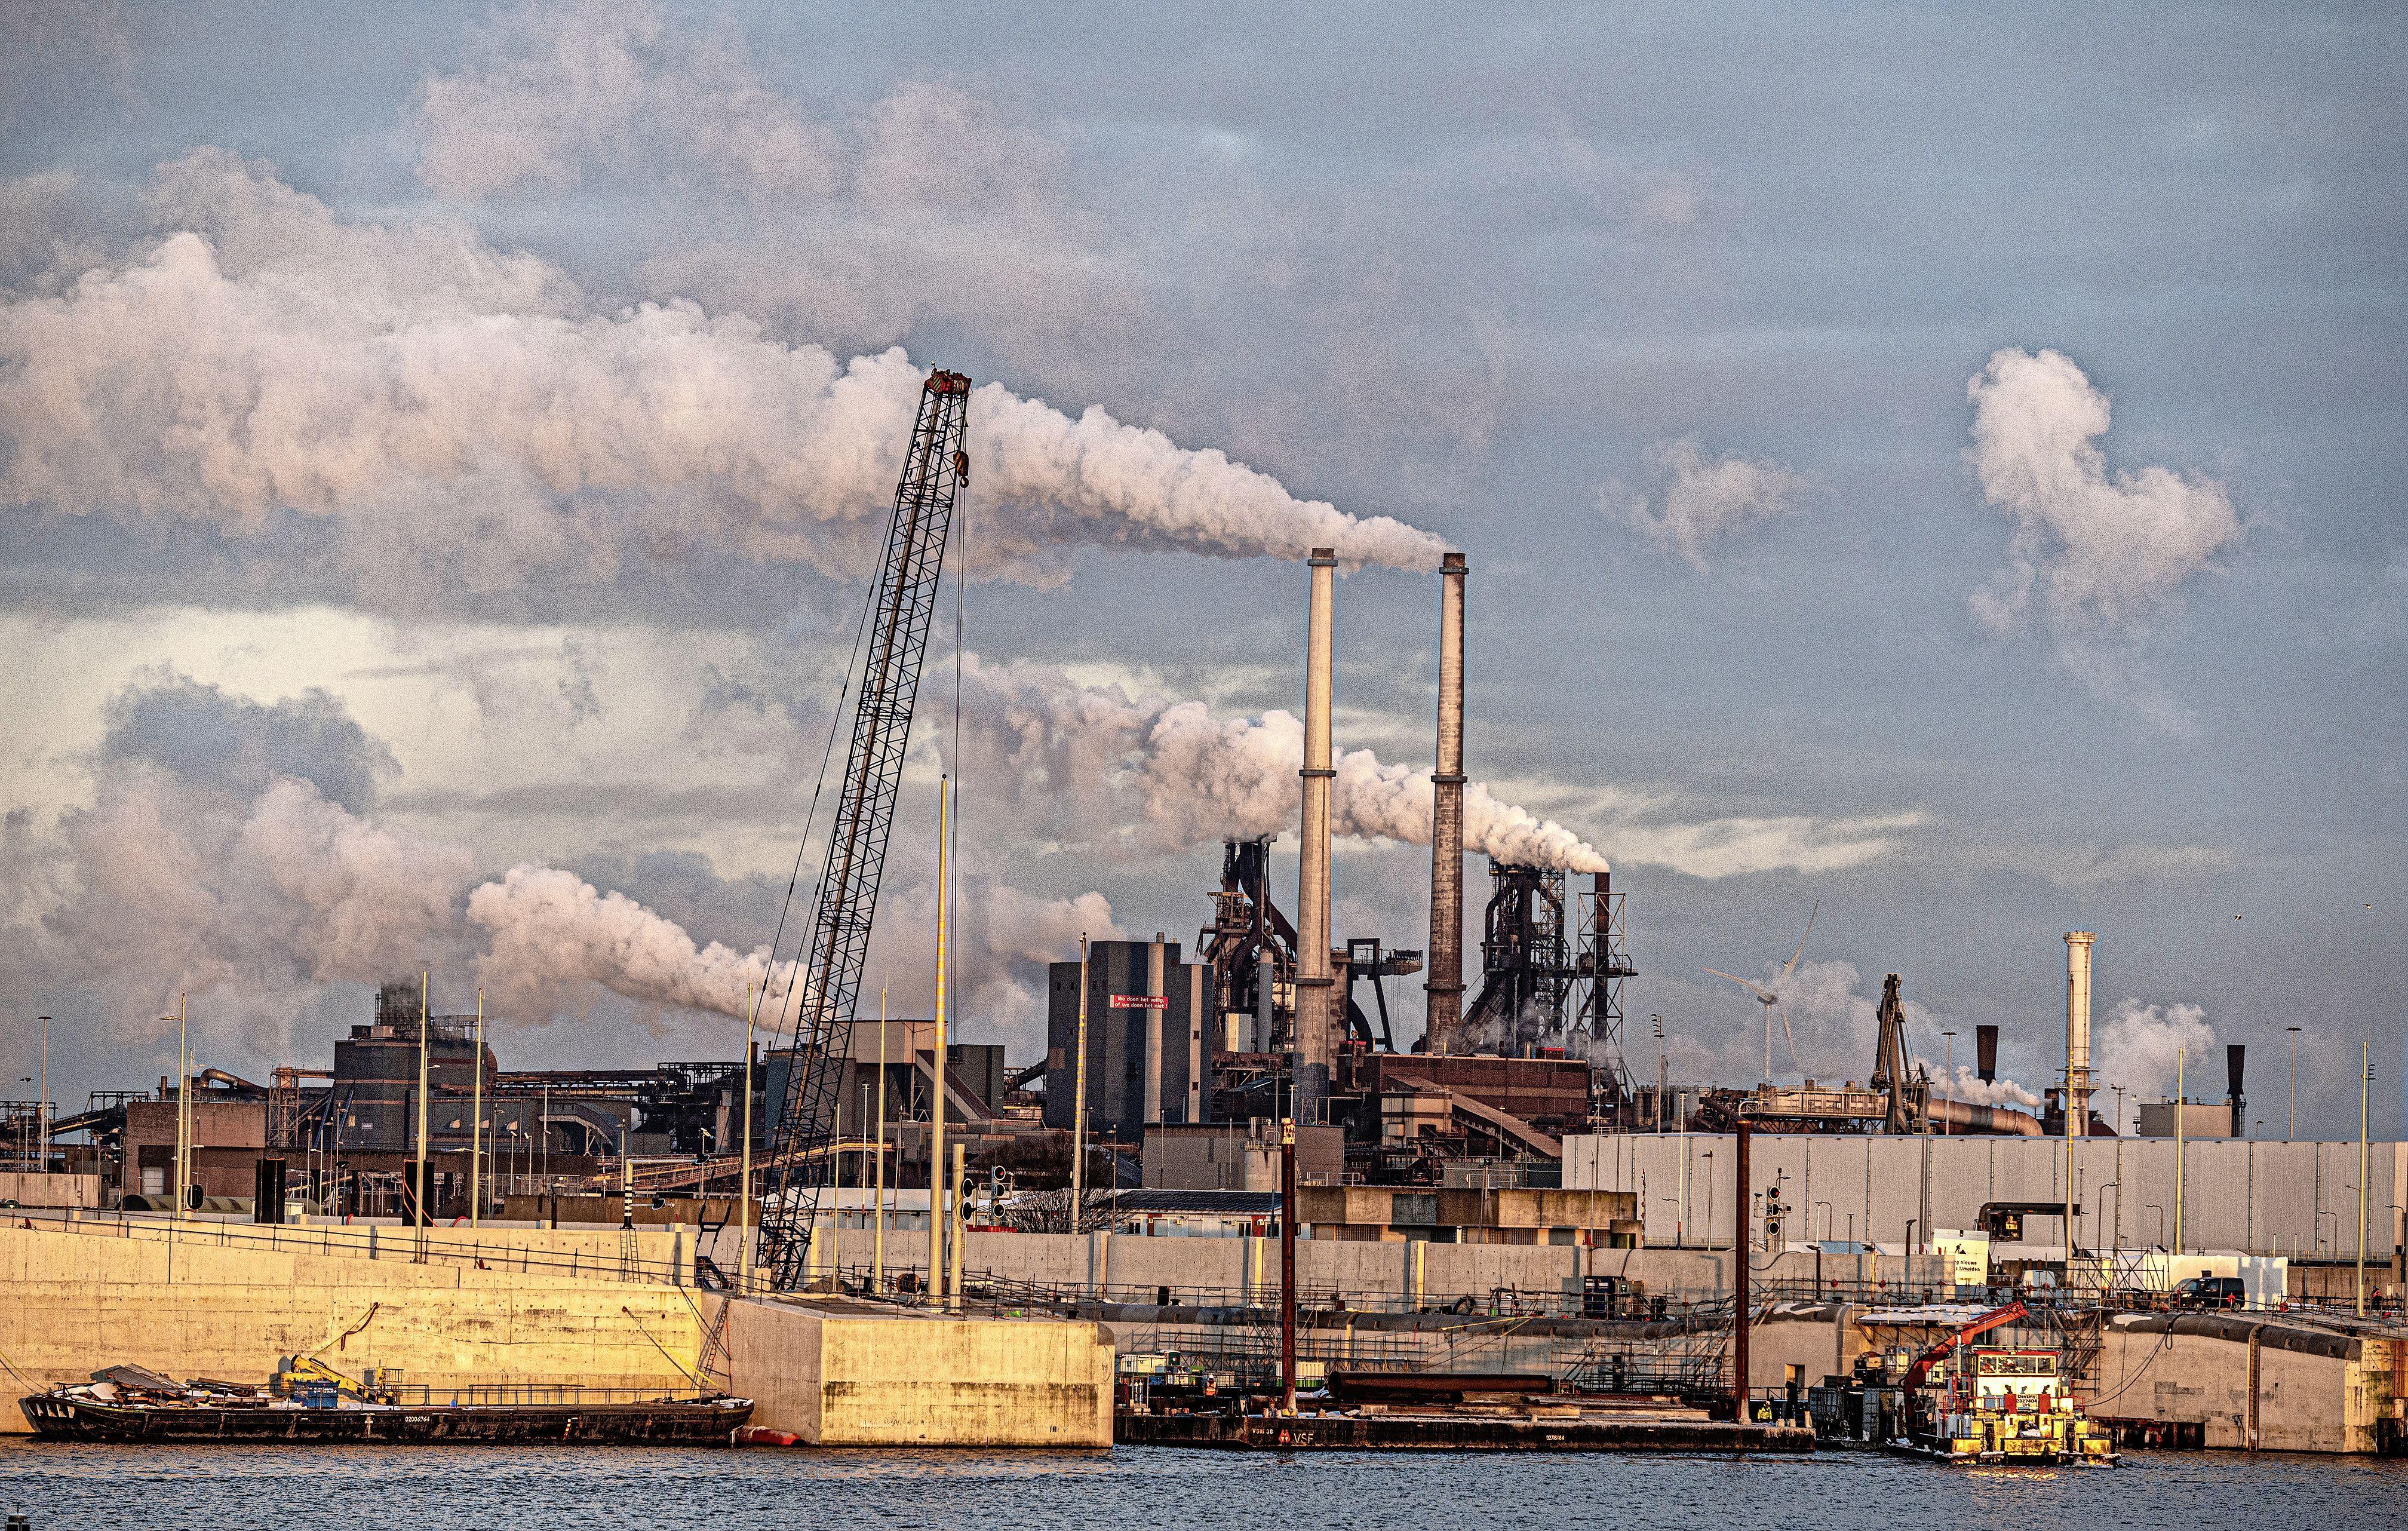 'Nederland moet bod doen op Tata Steel IJmuiden', zegt Heemskerks VVD-gemeenteraadslid Bertus Berghuis